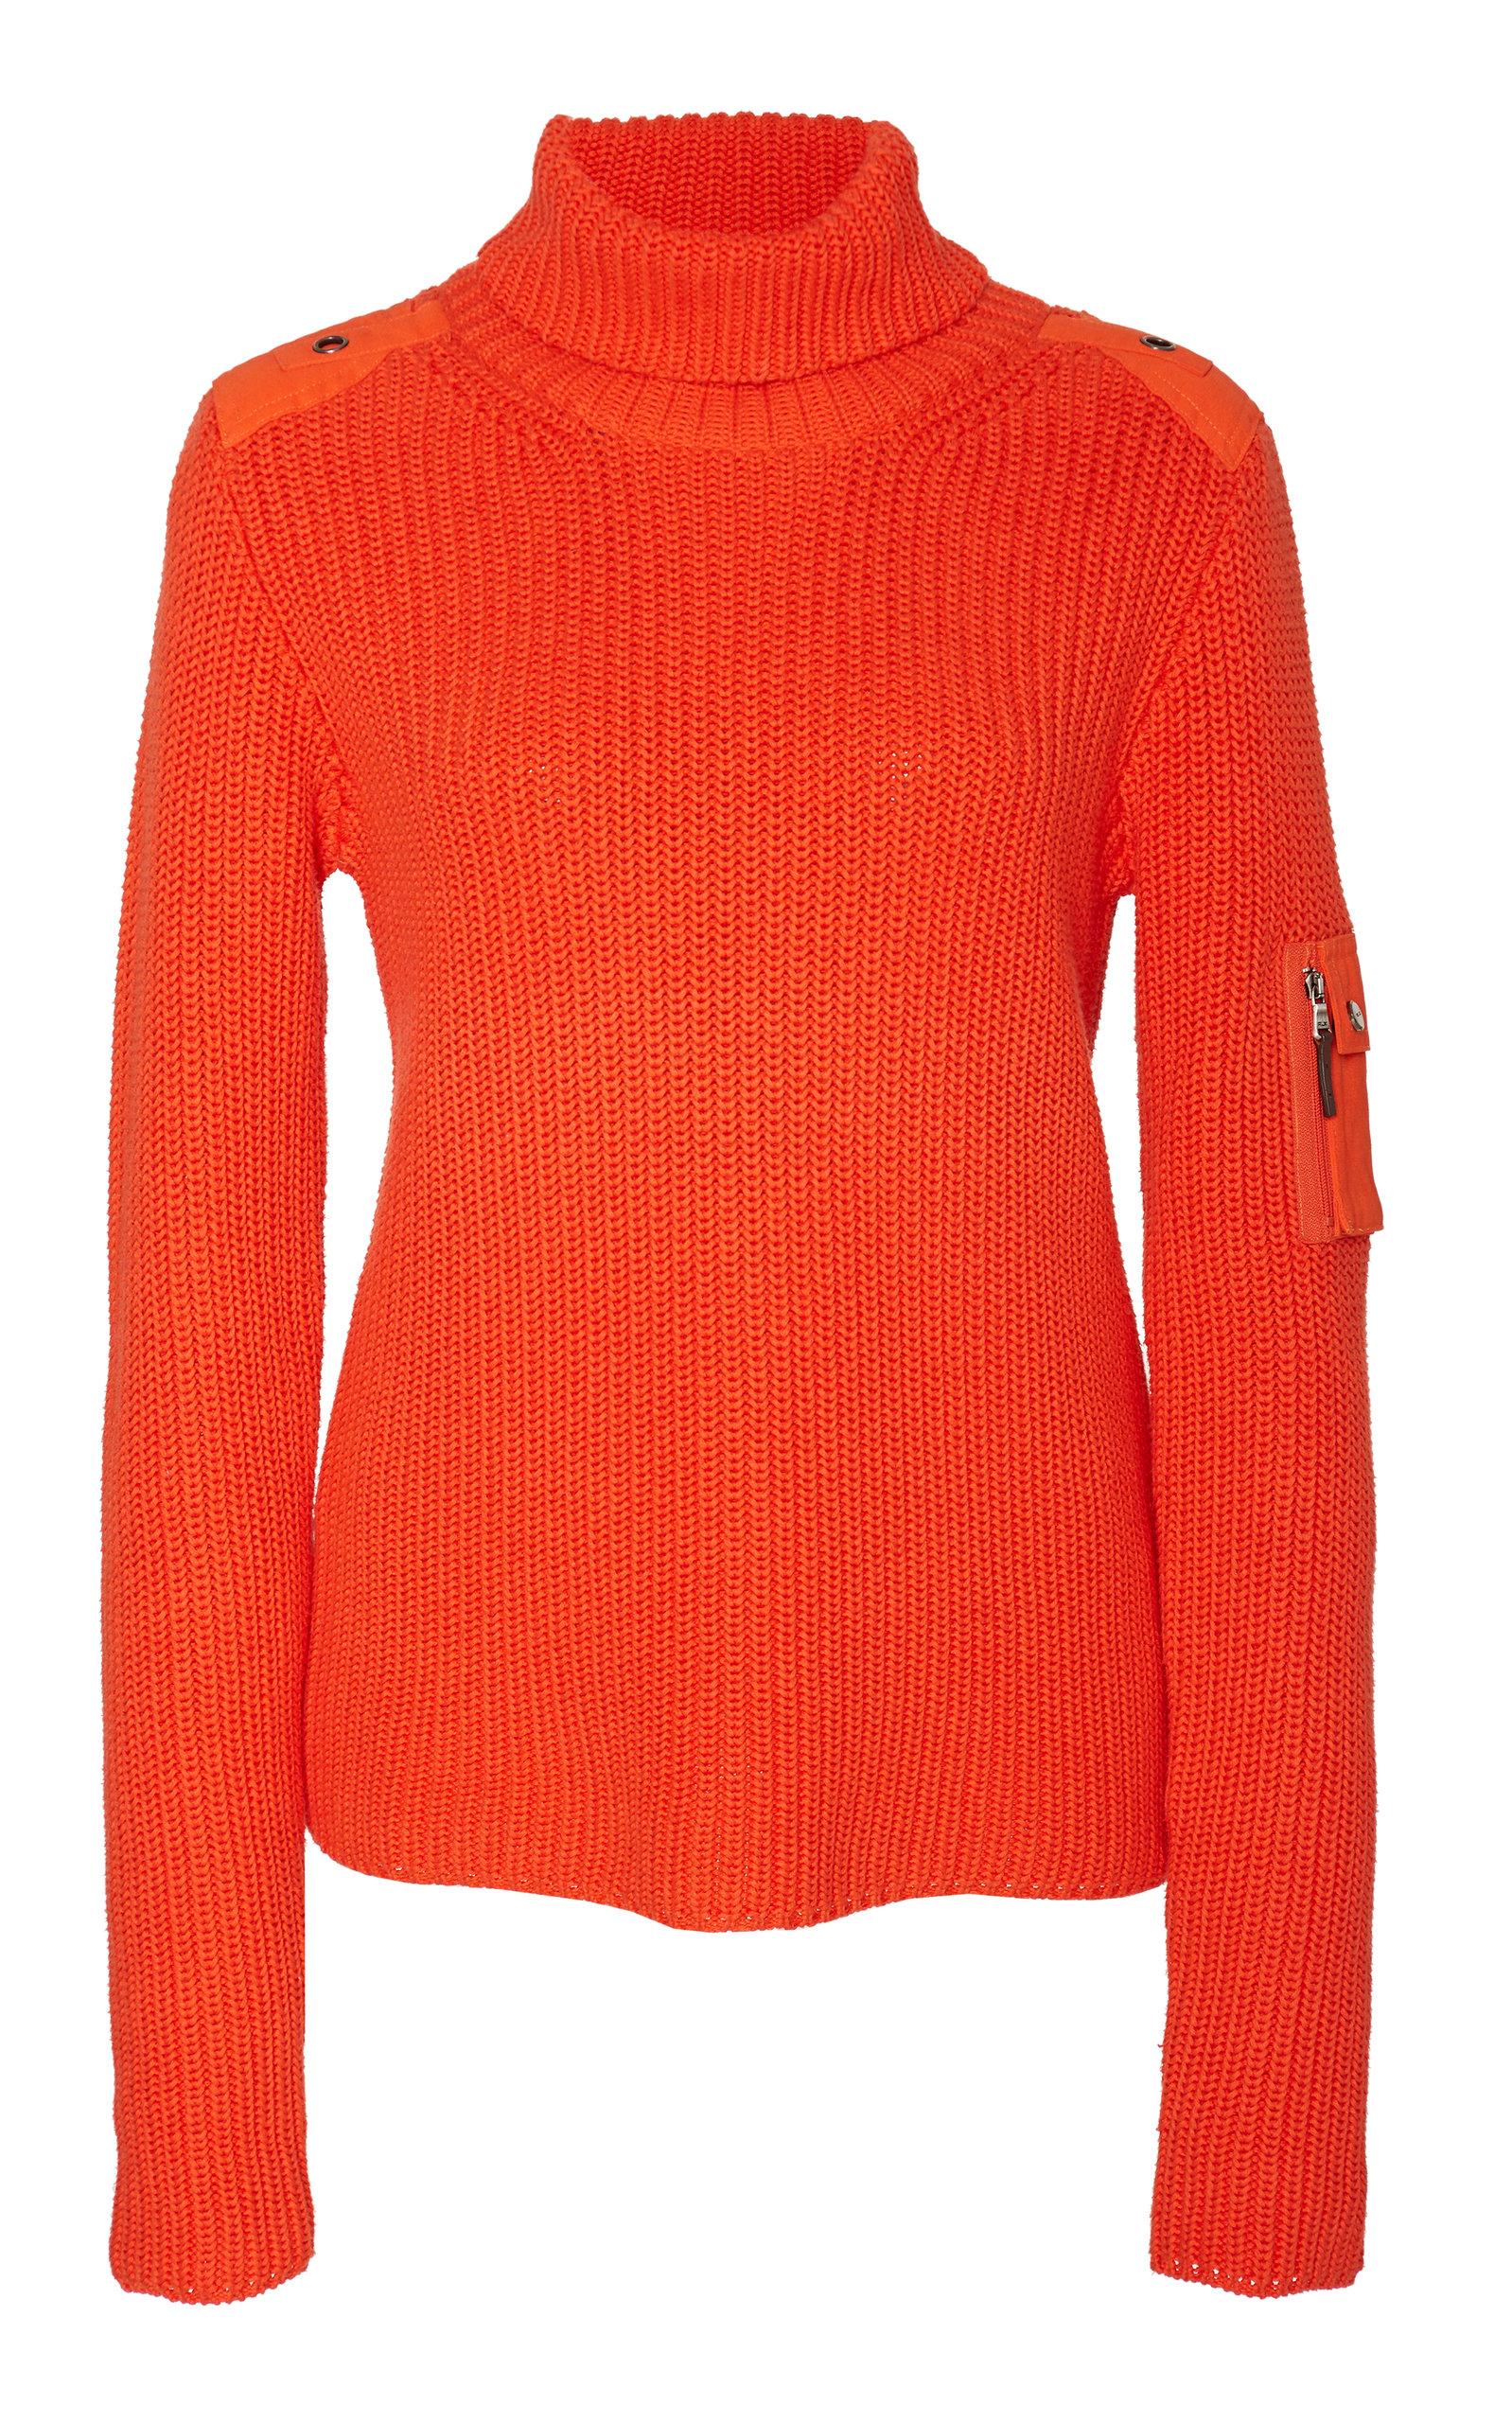 583c5b3c9716a2 Ribbed Turtleneck Cashmere Sweater by Ralph Lauren   Moda Operandi